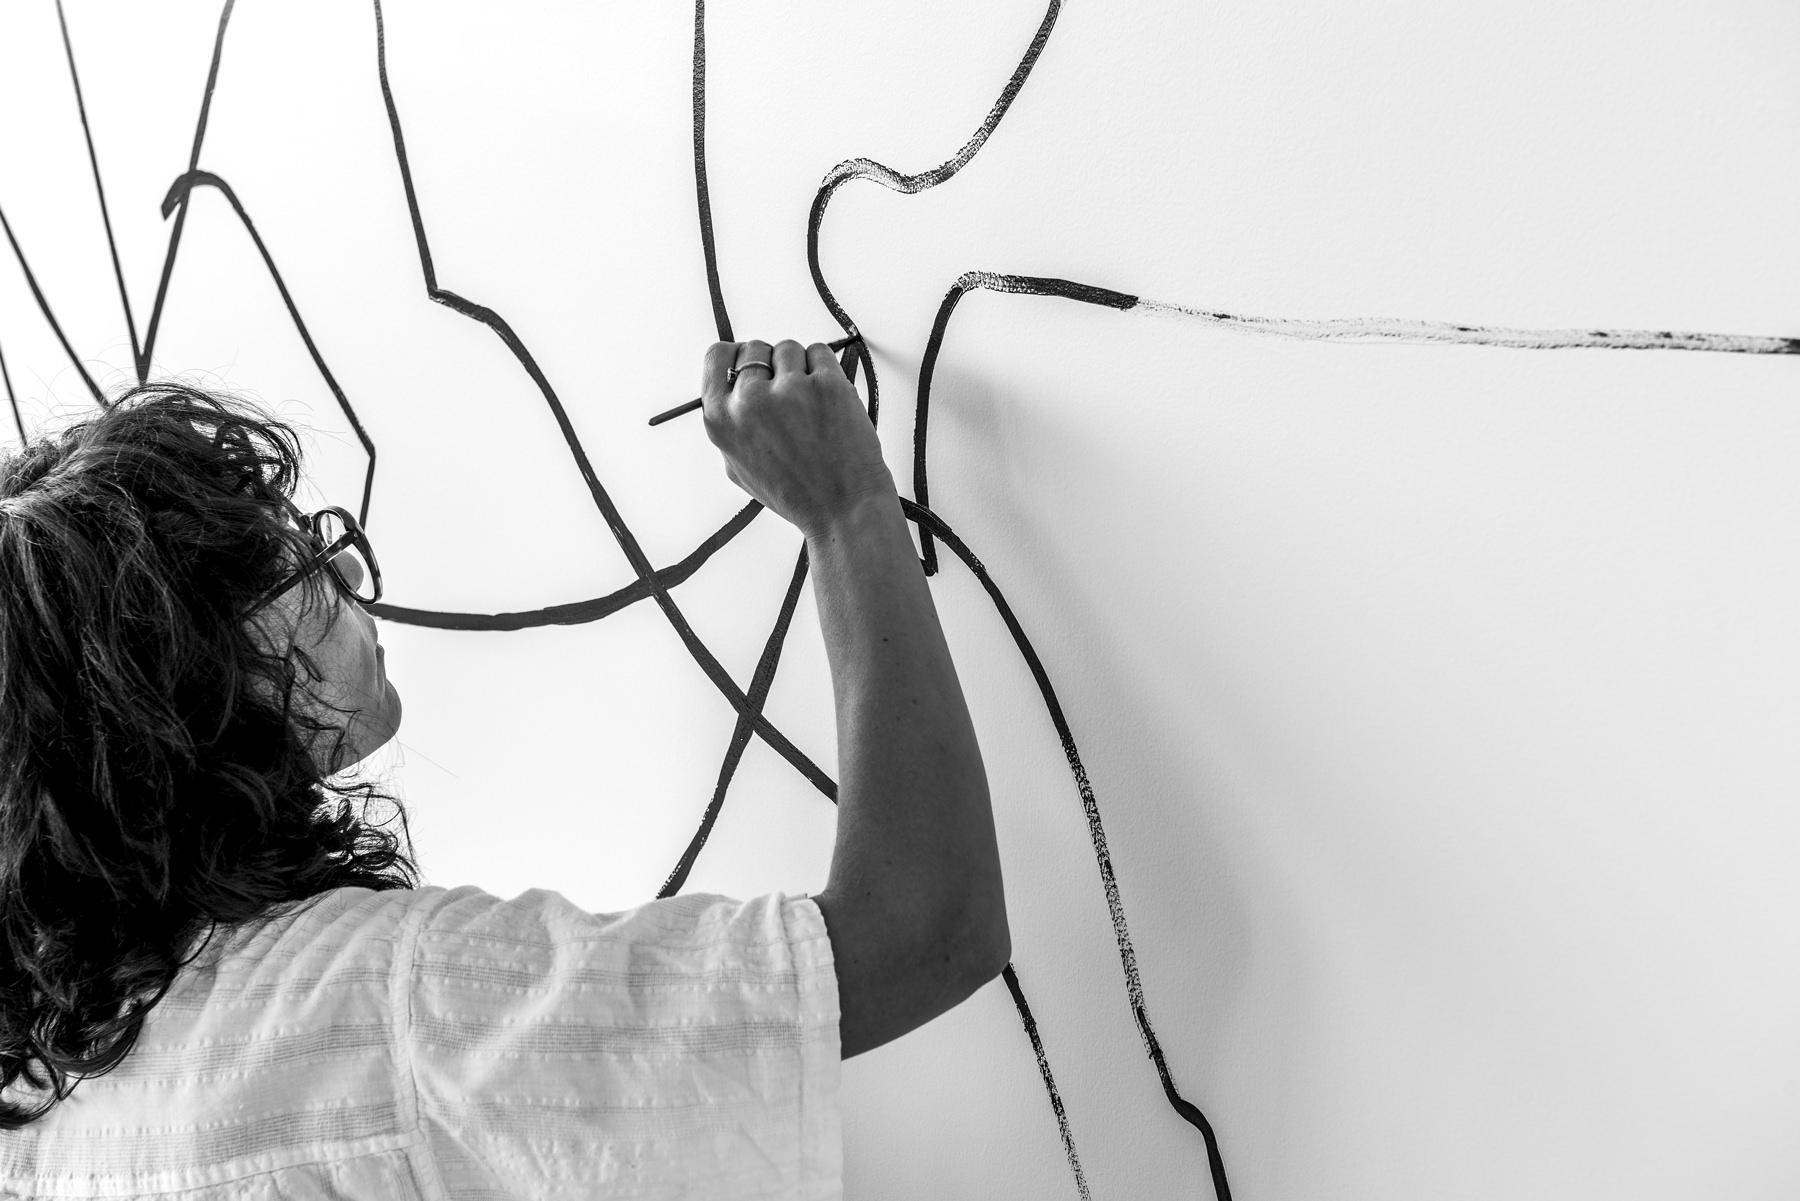 Avian Apartment Renovation Brisbane by Alicia Holgar, BTS with Artist Jessalyn Brooks | Yellowtrace